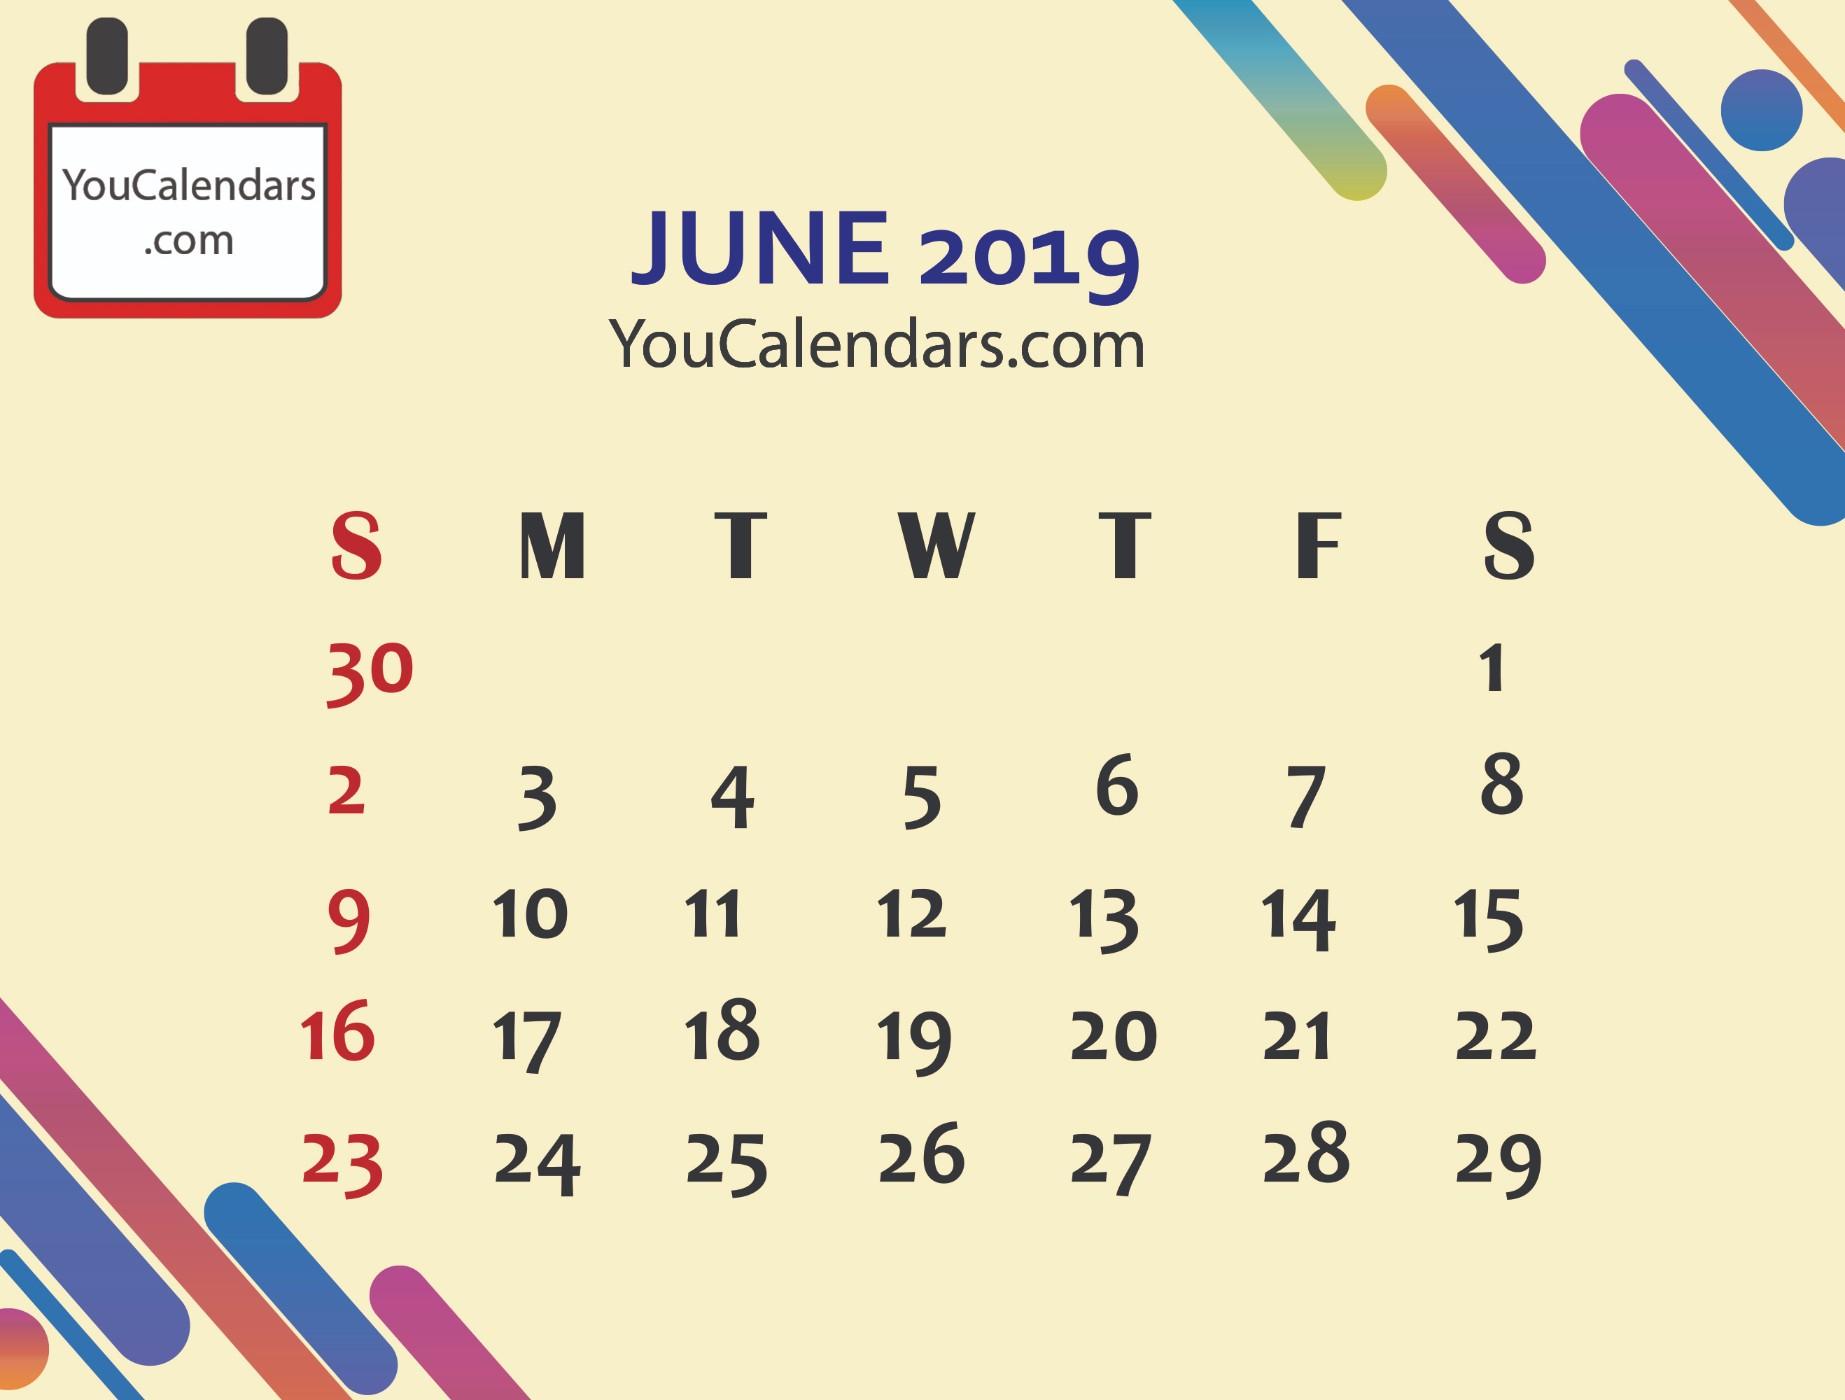 ✅Free June 2019 Calendar Printable Template - You Calendars for Free Downloadable Cute Calendar Template